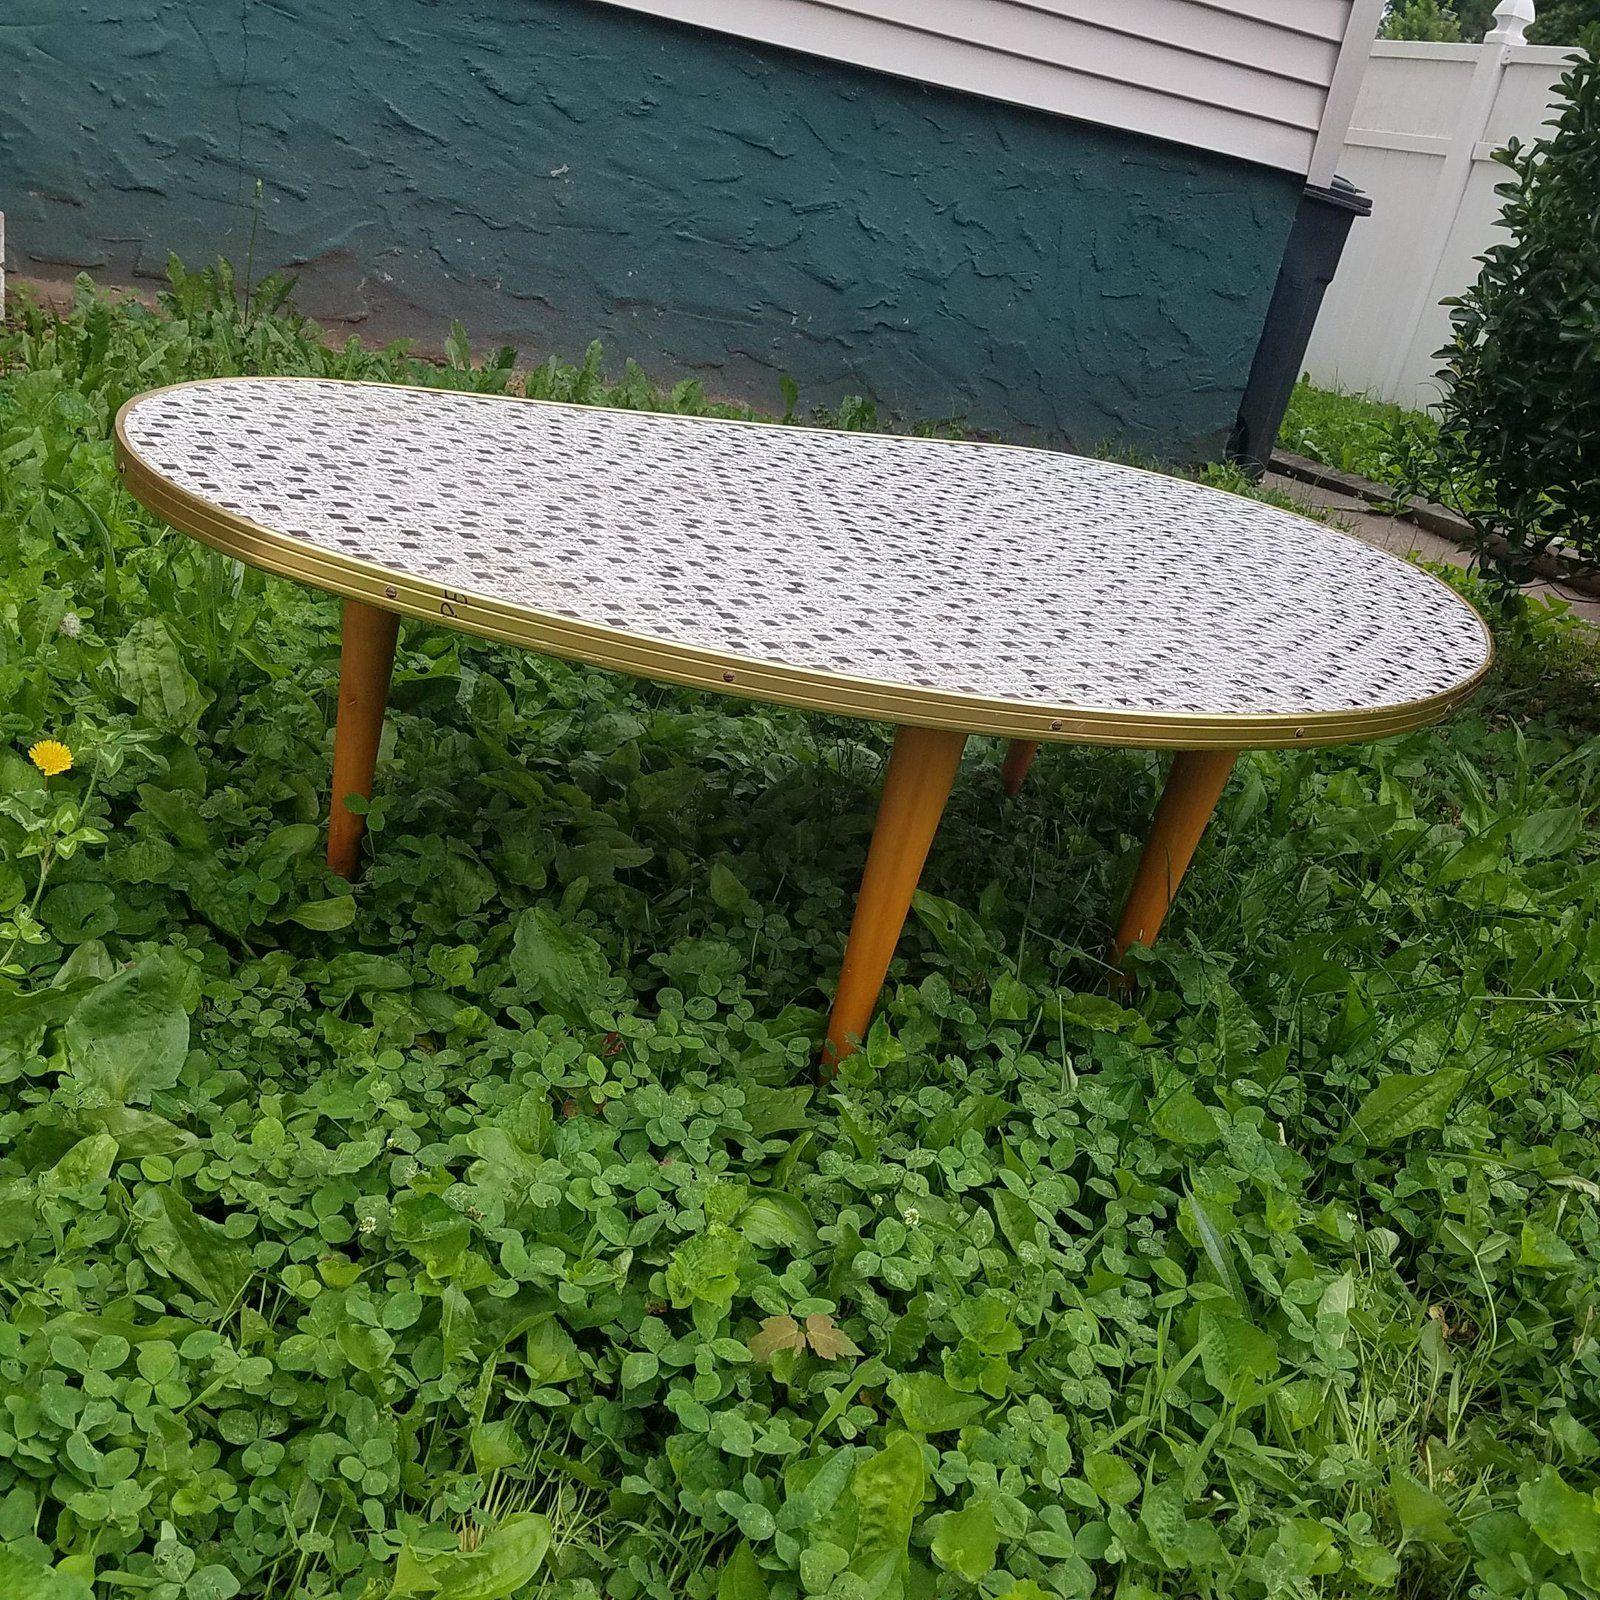 Mid Century Modern Kidney Shaped Coffee Table With Small Mosaic Tiles Coffee Table Tiled Coffee Table Modern Mosaic Tile [ 1600 x 1600 Pixel ]